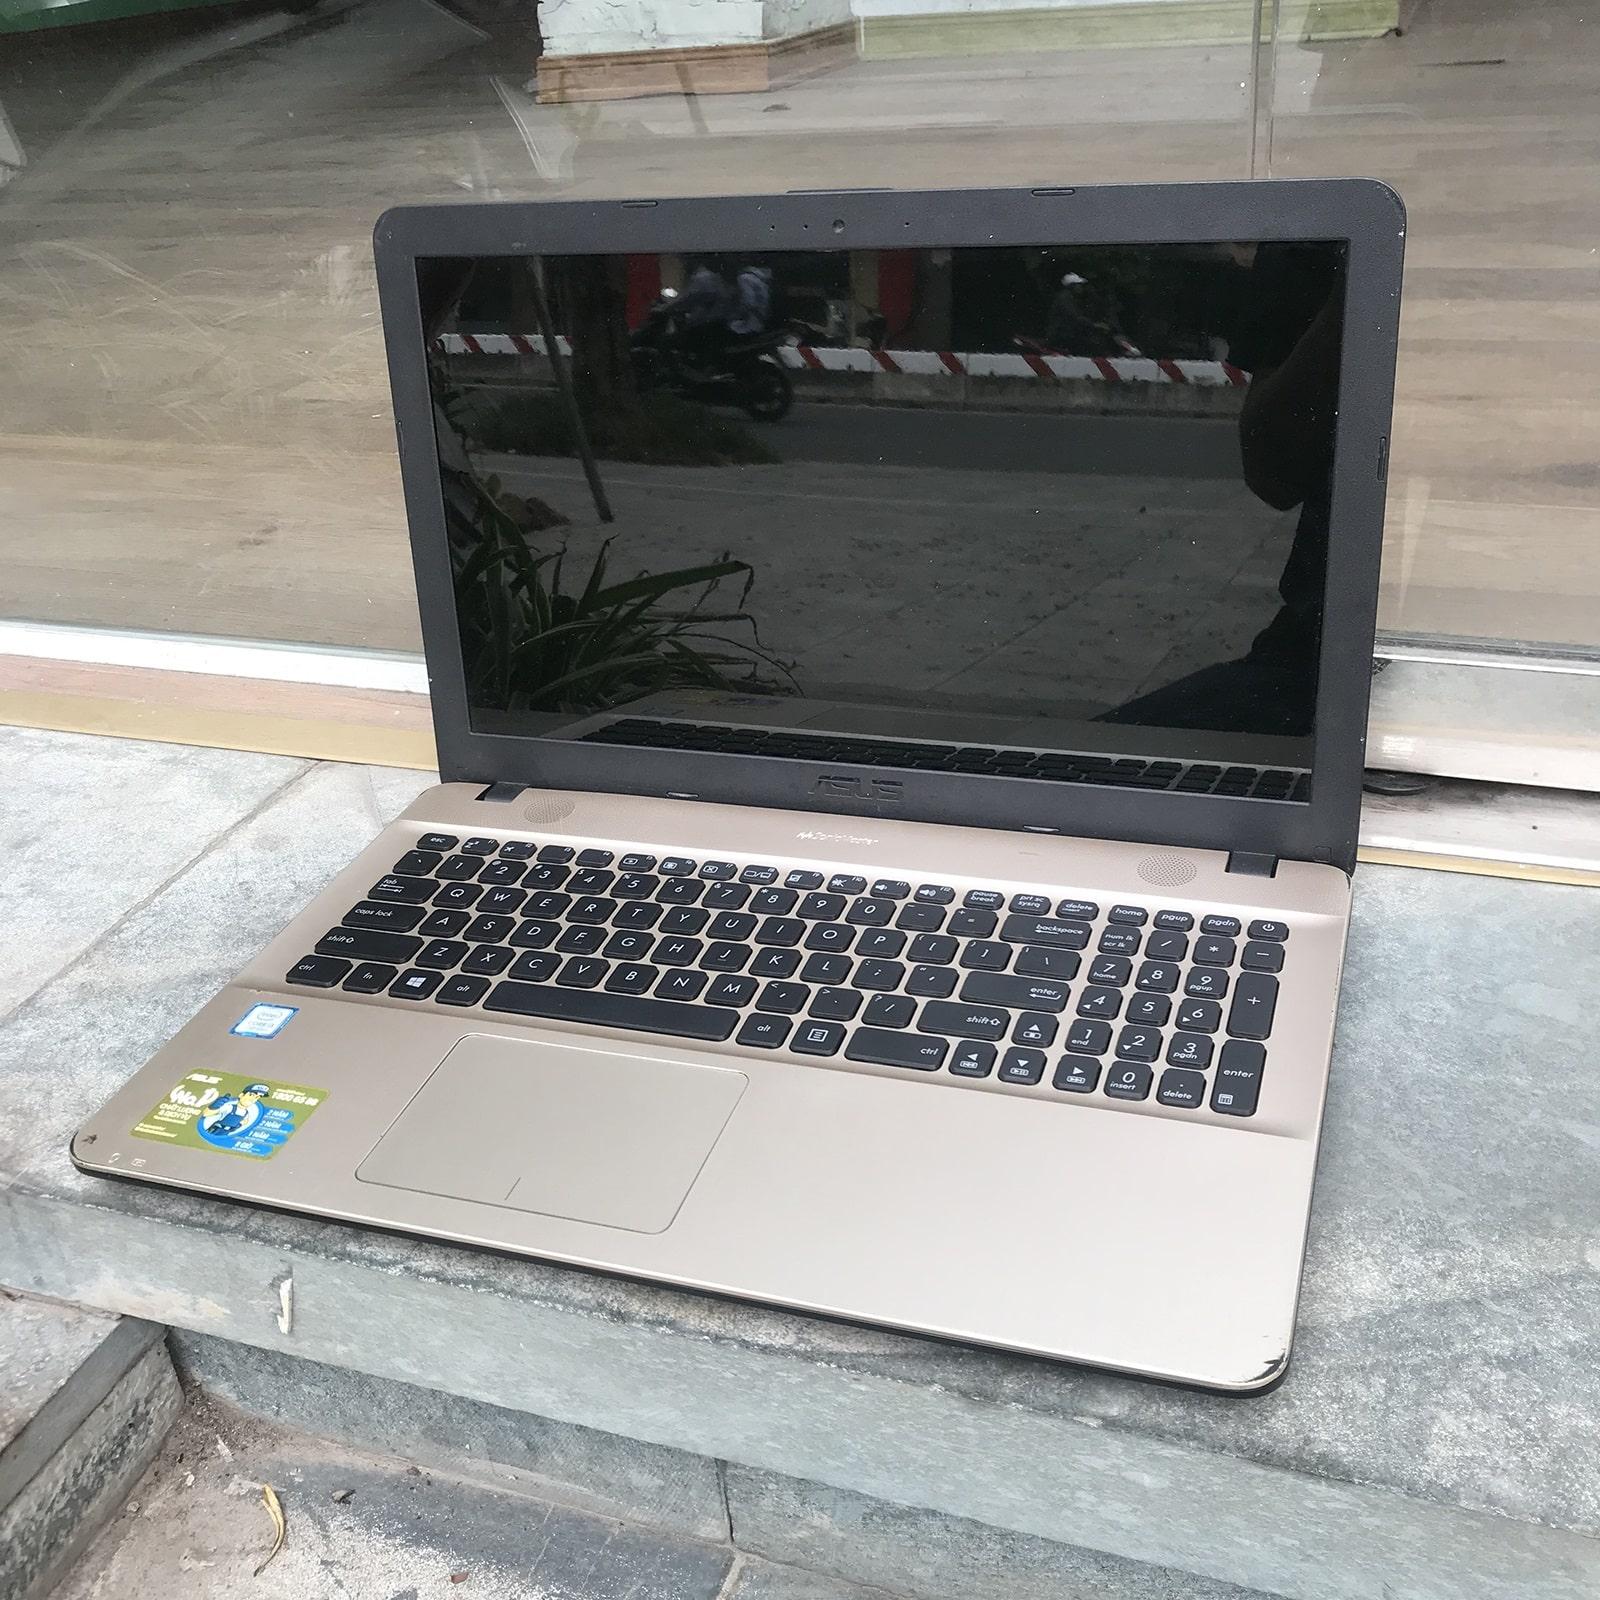 ASUS X541U Core i3 7100U, Ram 4GB, HDD 1TB, 15.6 Inch HD, HD Graphics 620